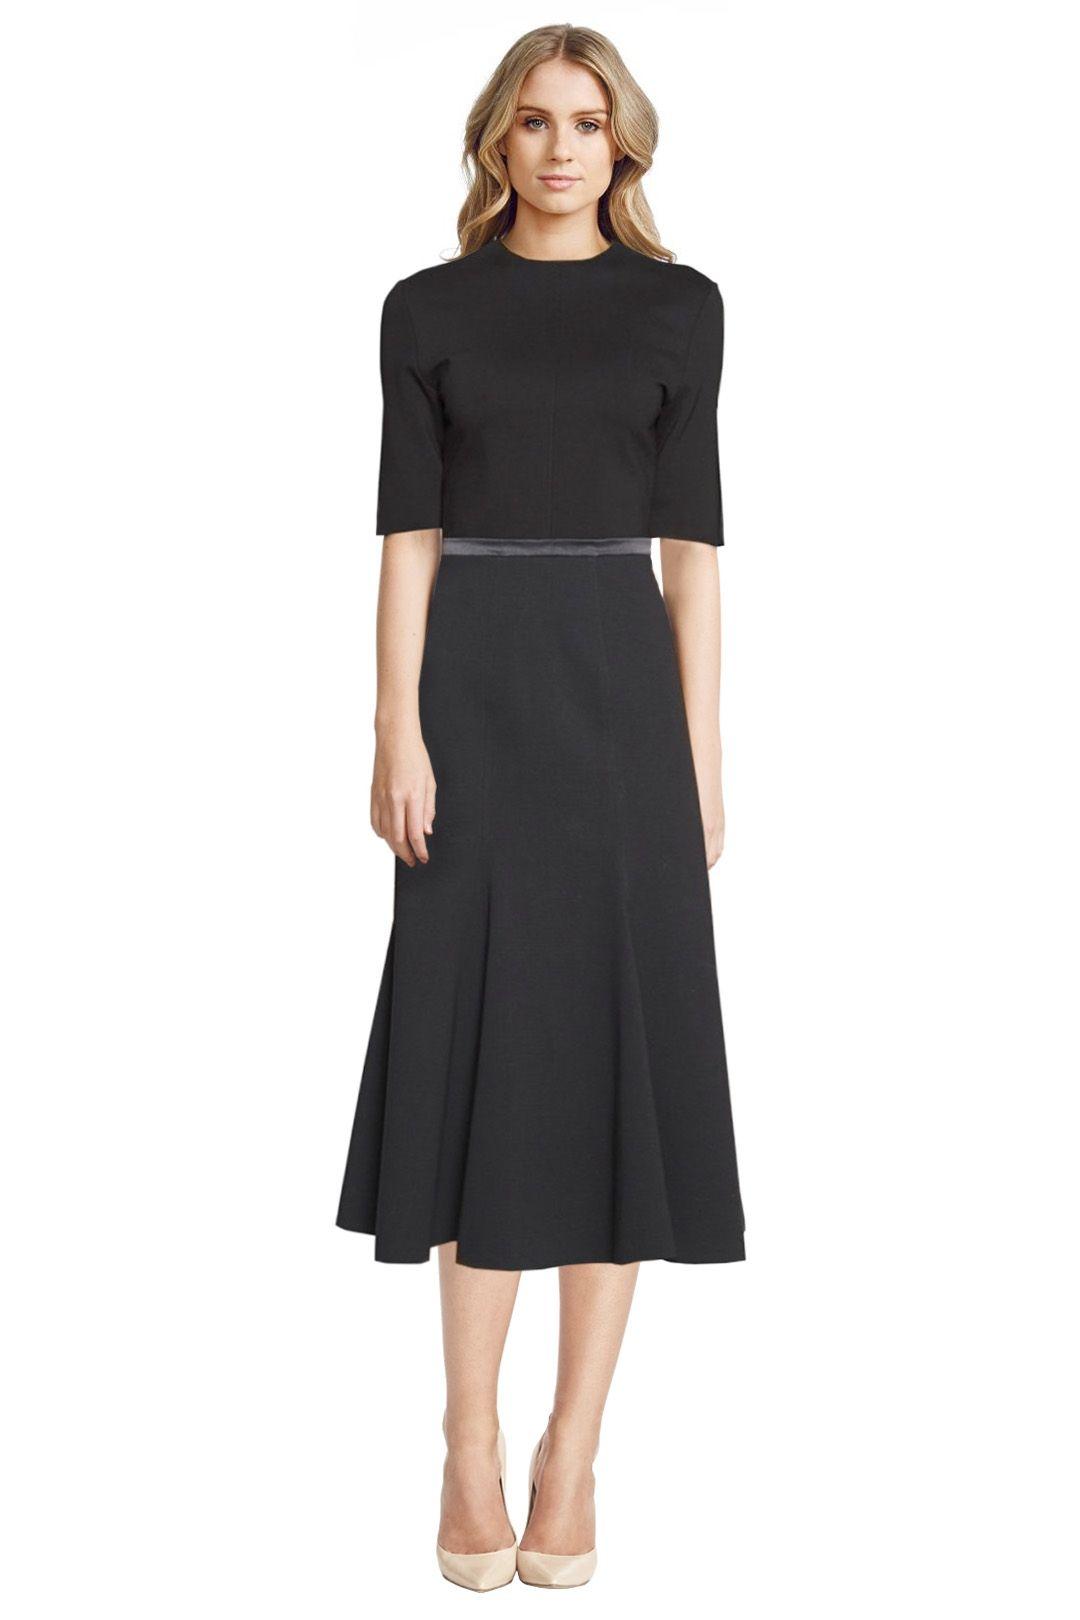 Camilla and Marc - Stellar Dress - Black - Front